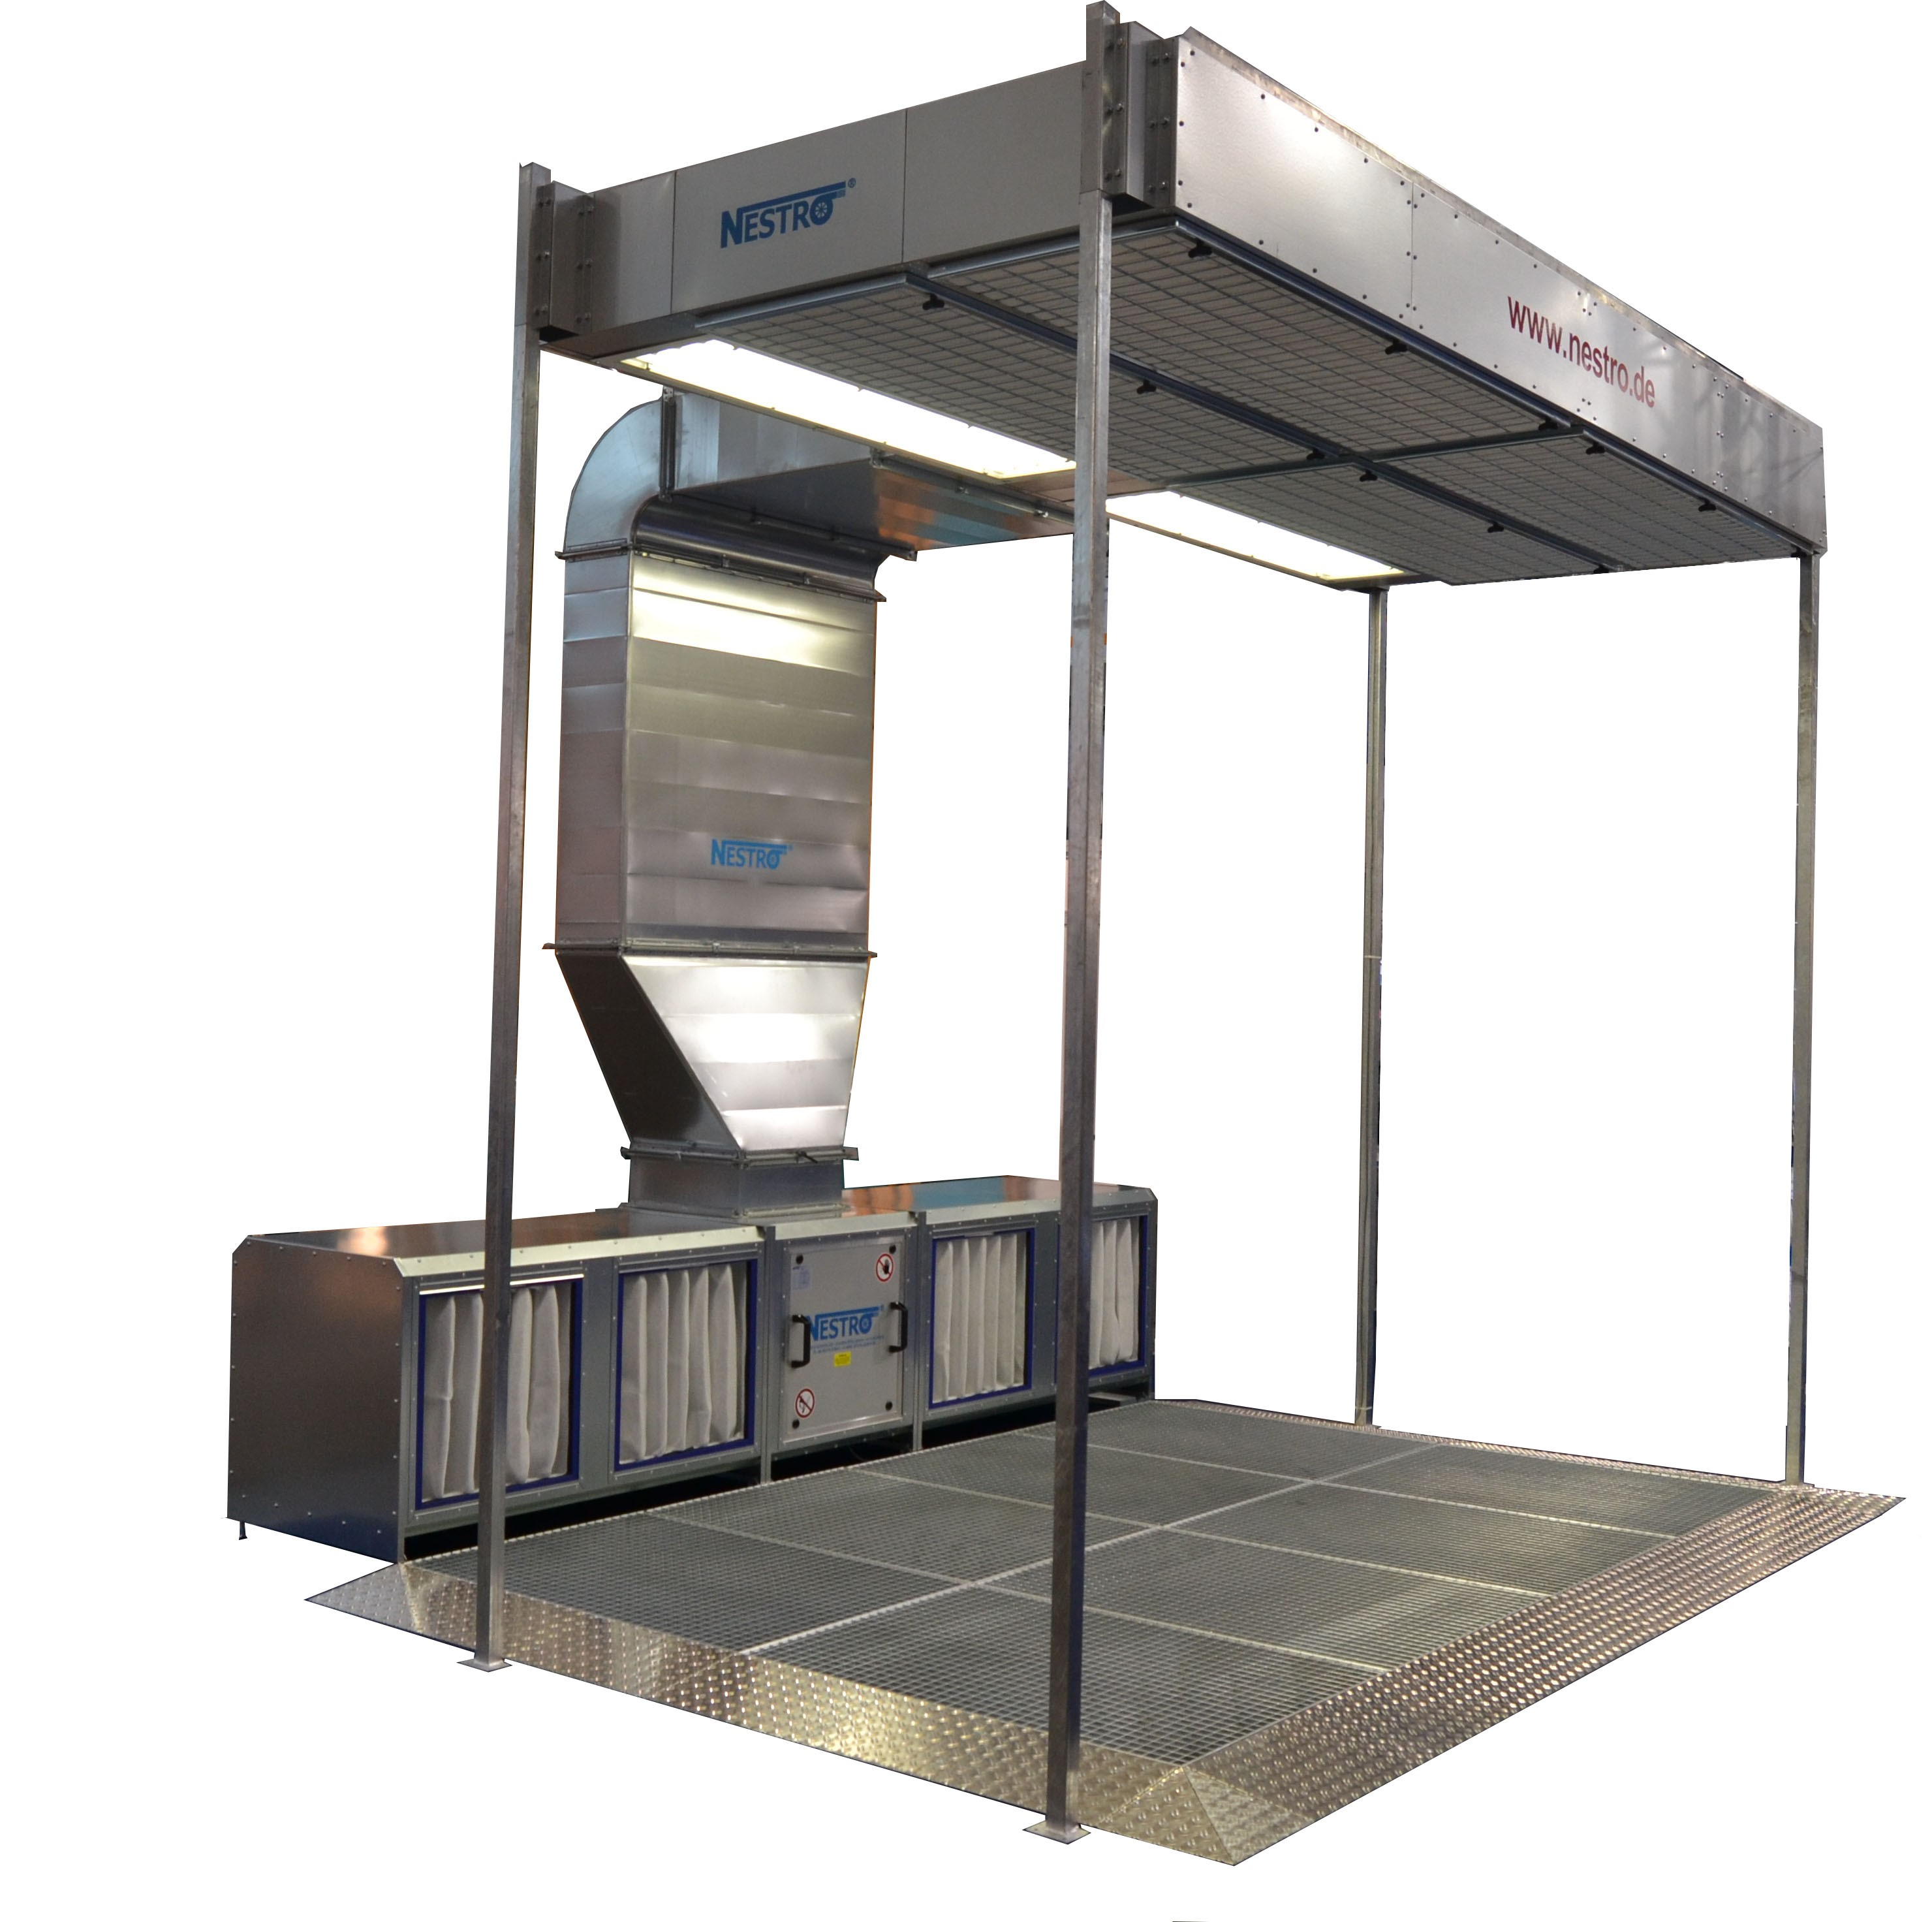 NESTRO Open Sanding Booth